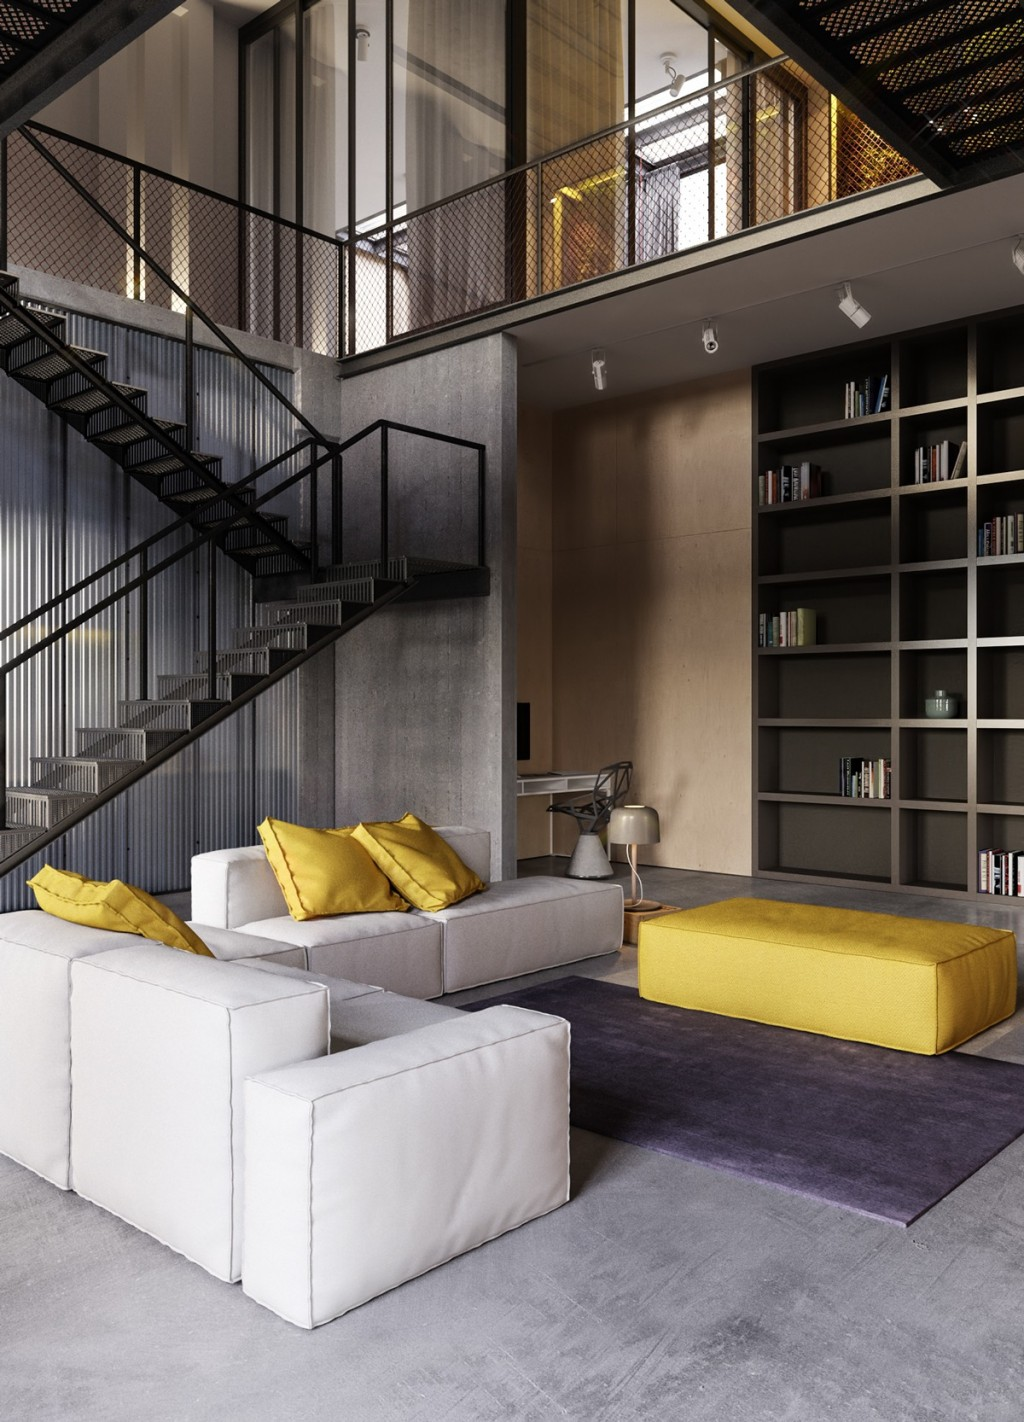 loft interior design ideas. Black Bedroom Furniture Sets. Home Design Ideas